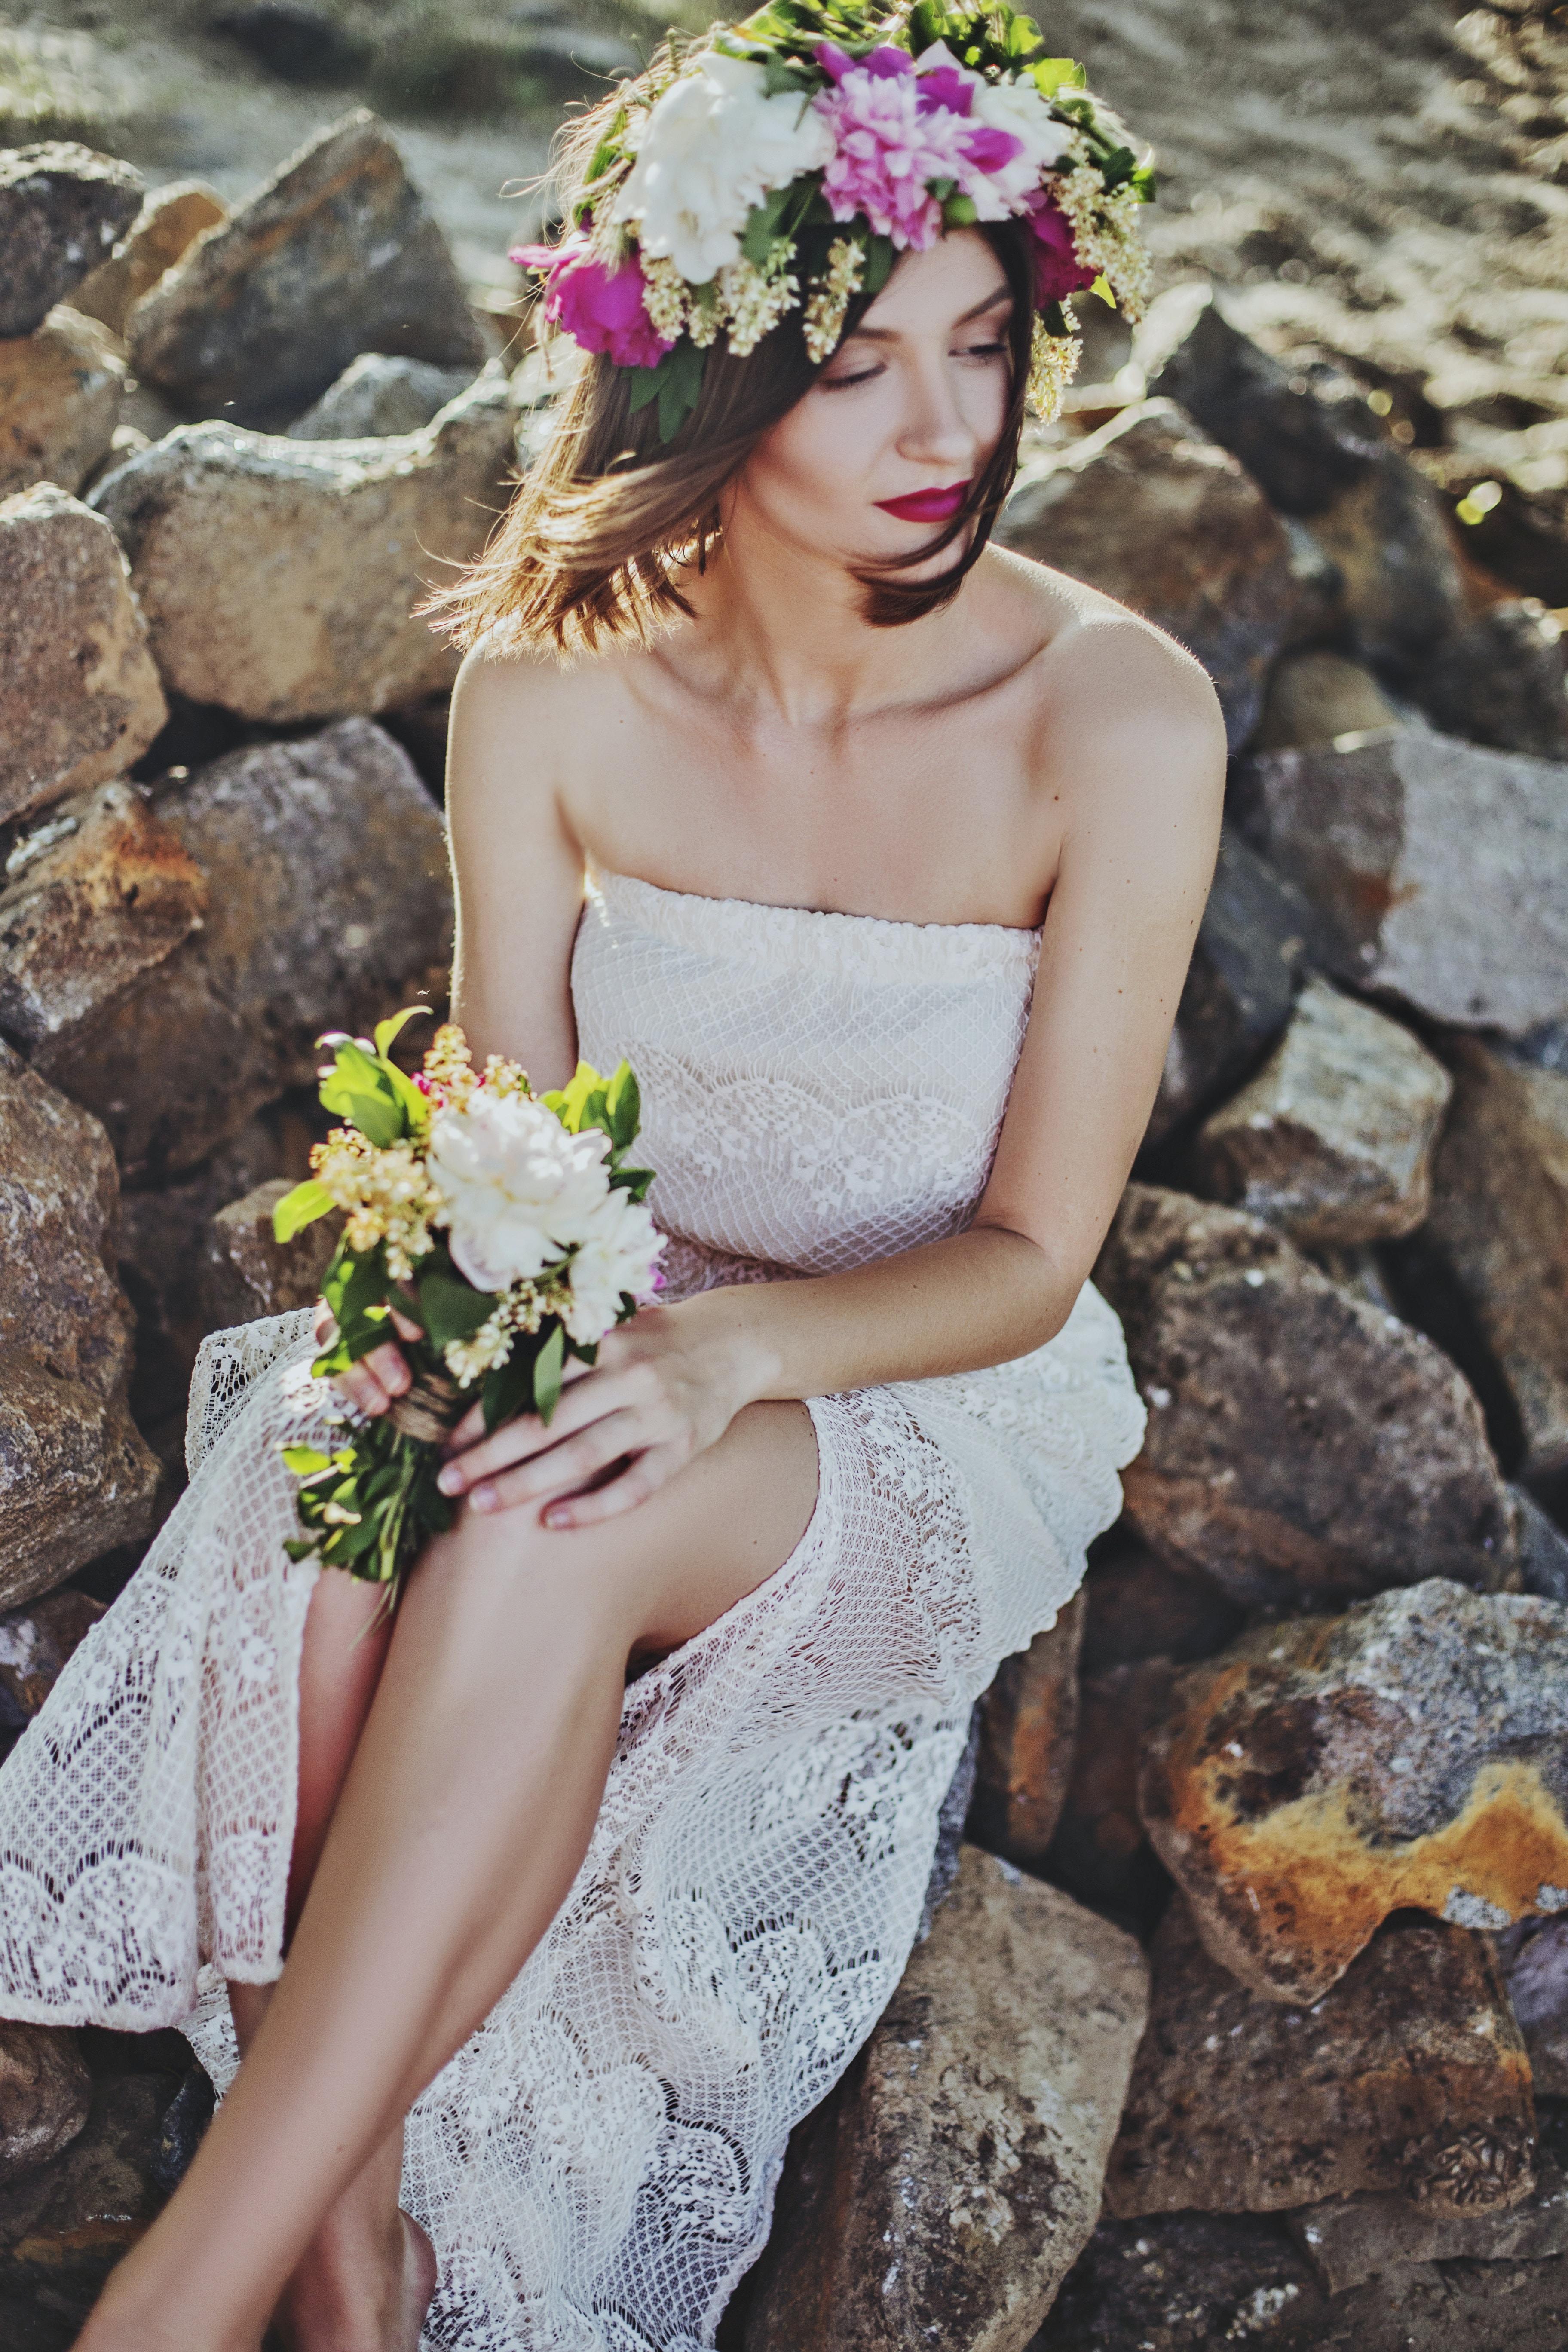 woman in white tube dress sitting on rock